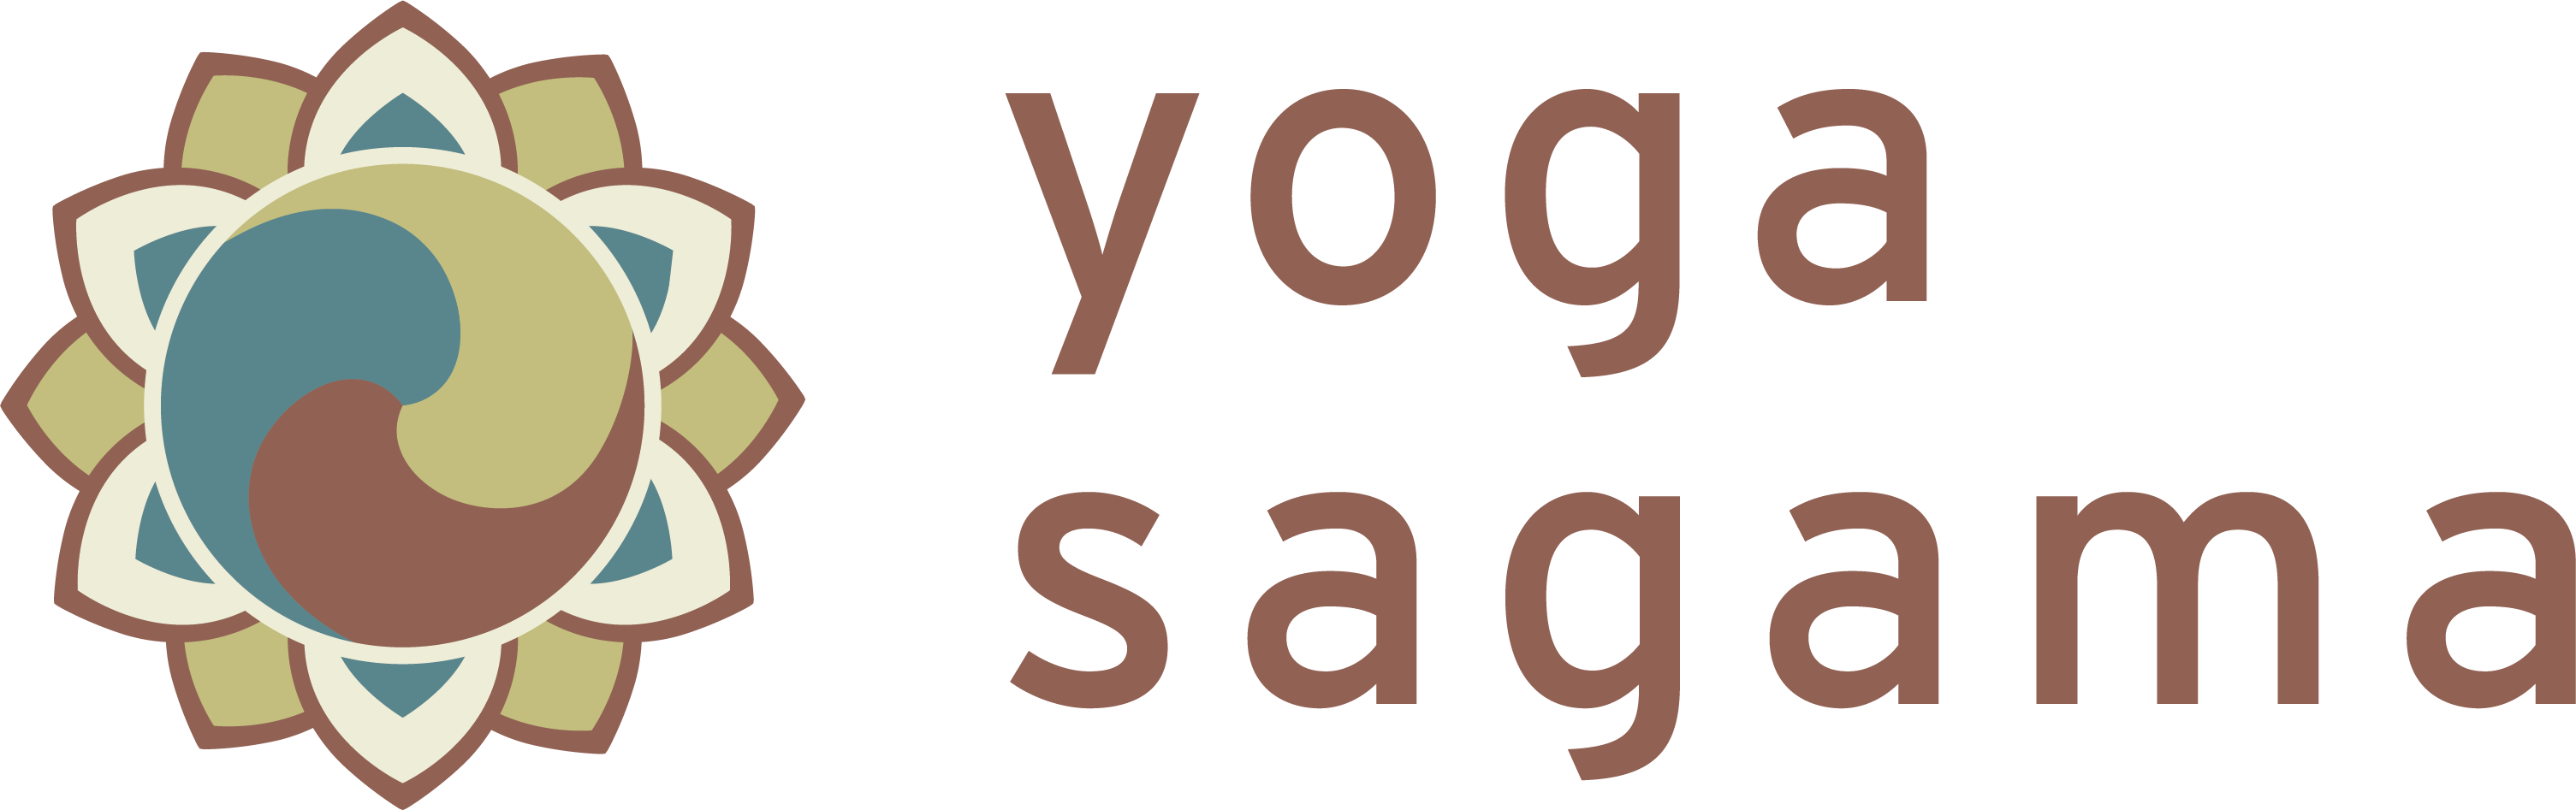 Yoga Sagama